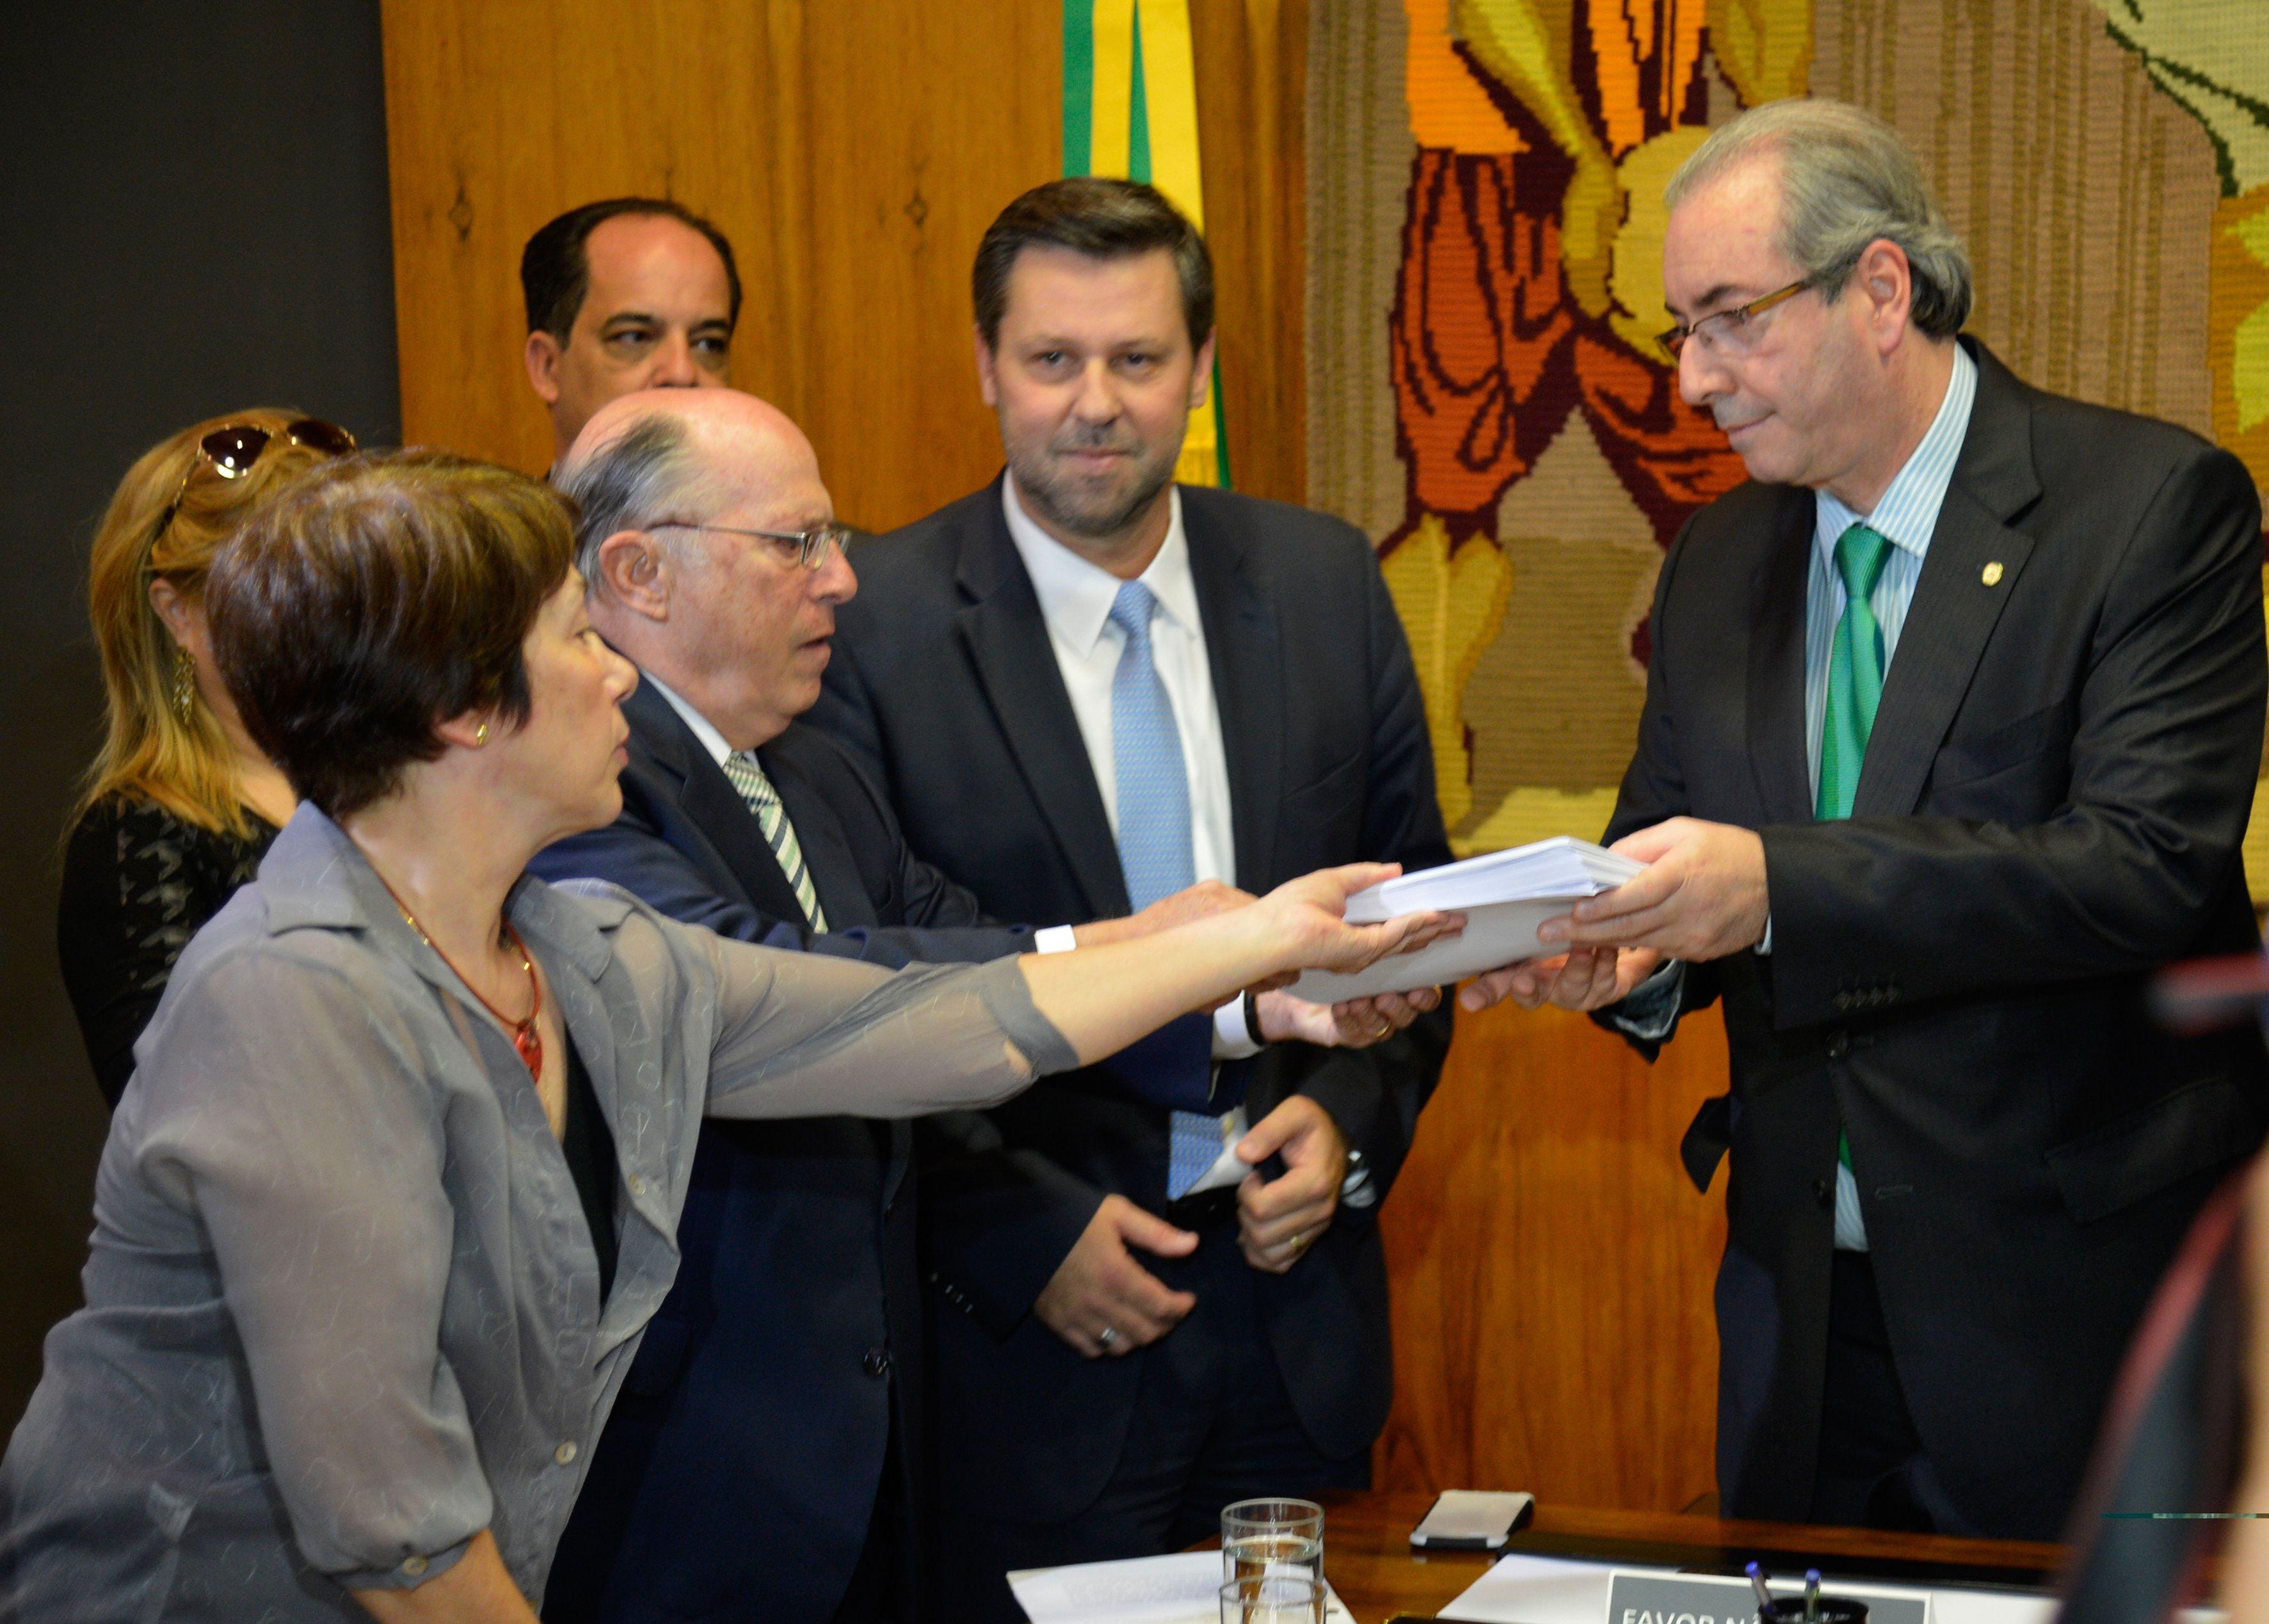 Câmara recebe pedido de impeachment de Dilma elaborado por Hélio Bicudo